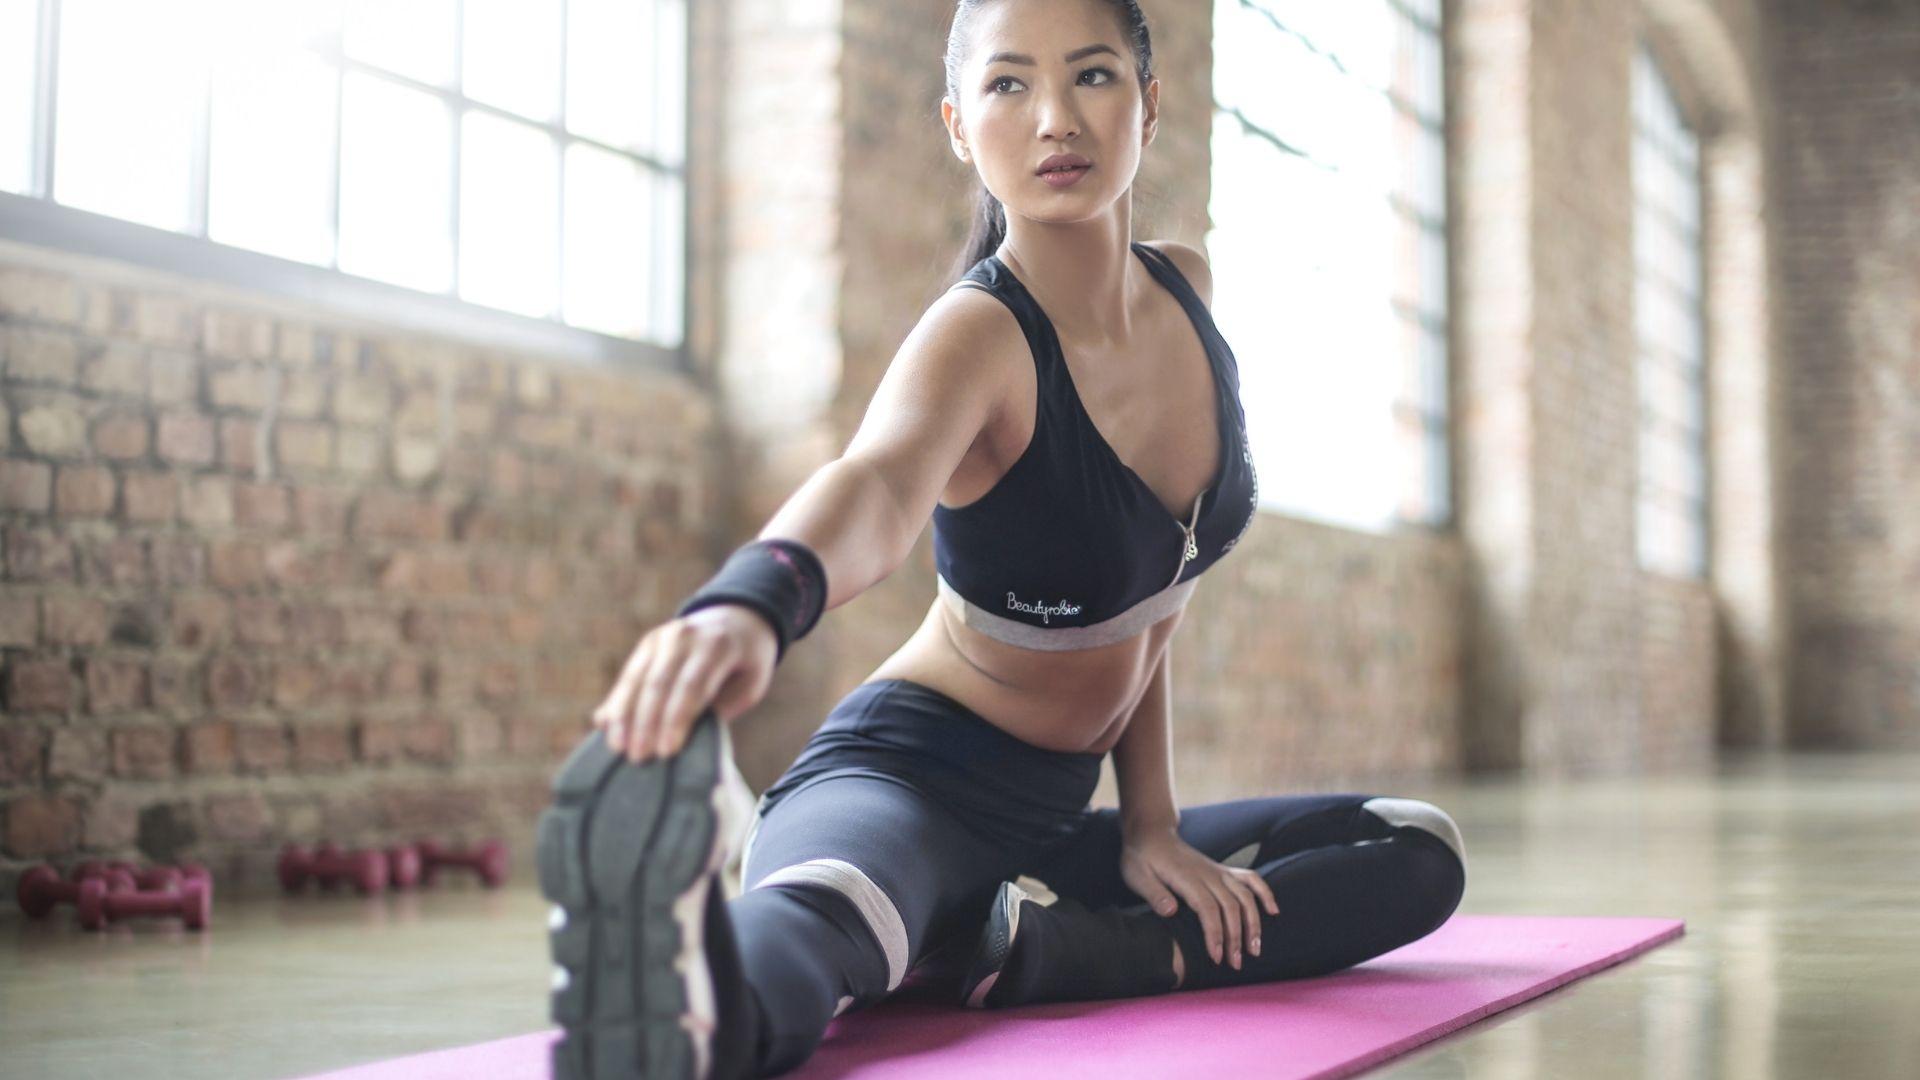 Cool Down Übung - Stretching